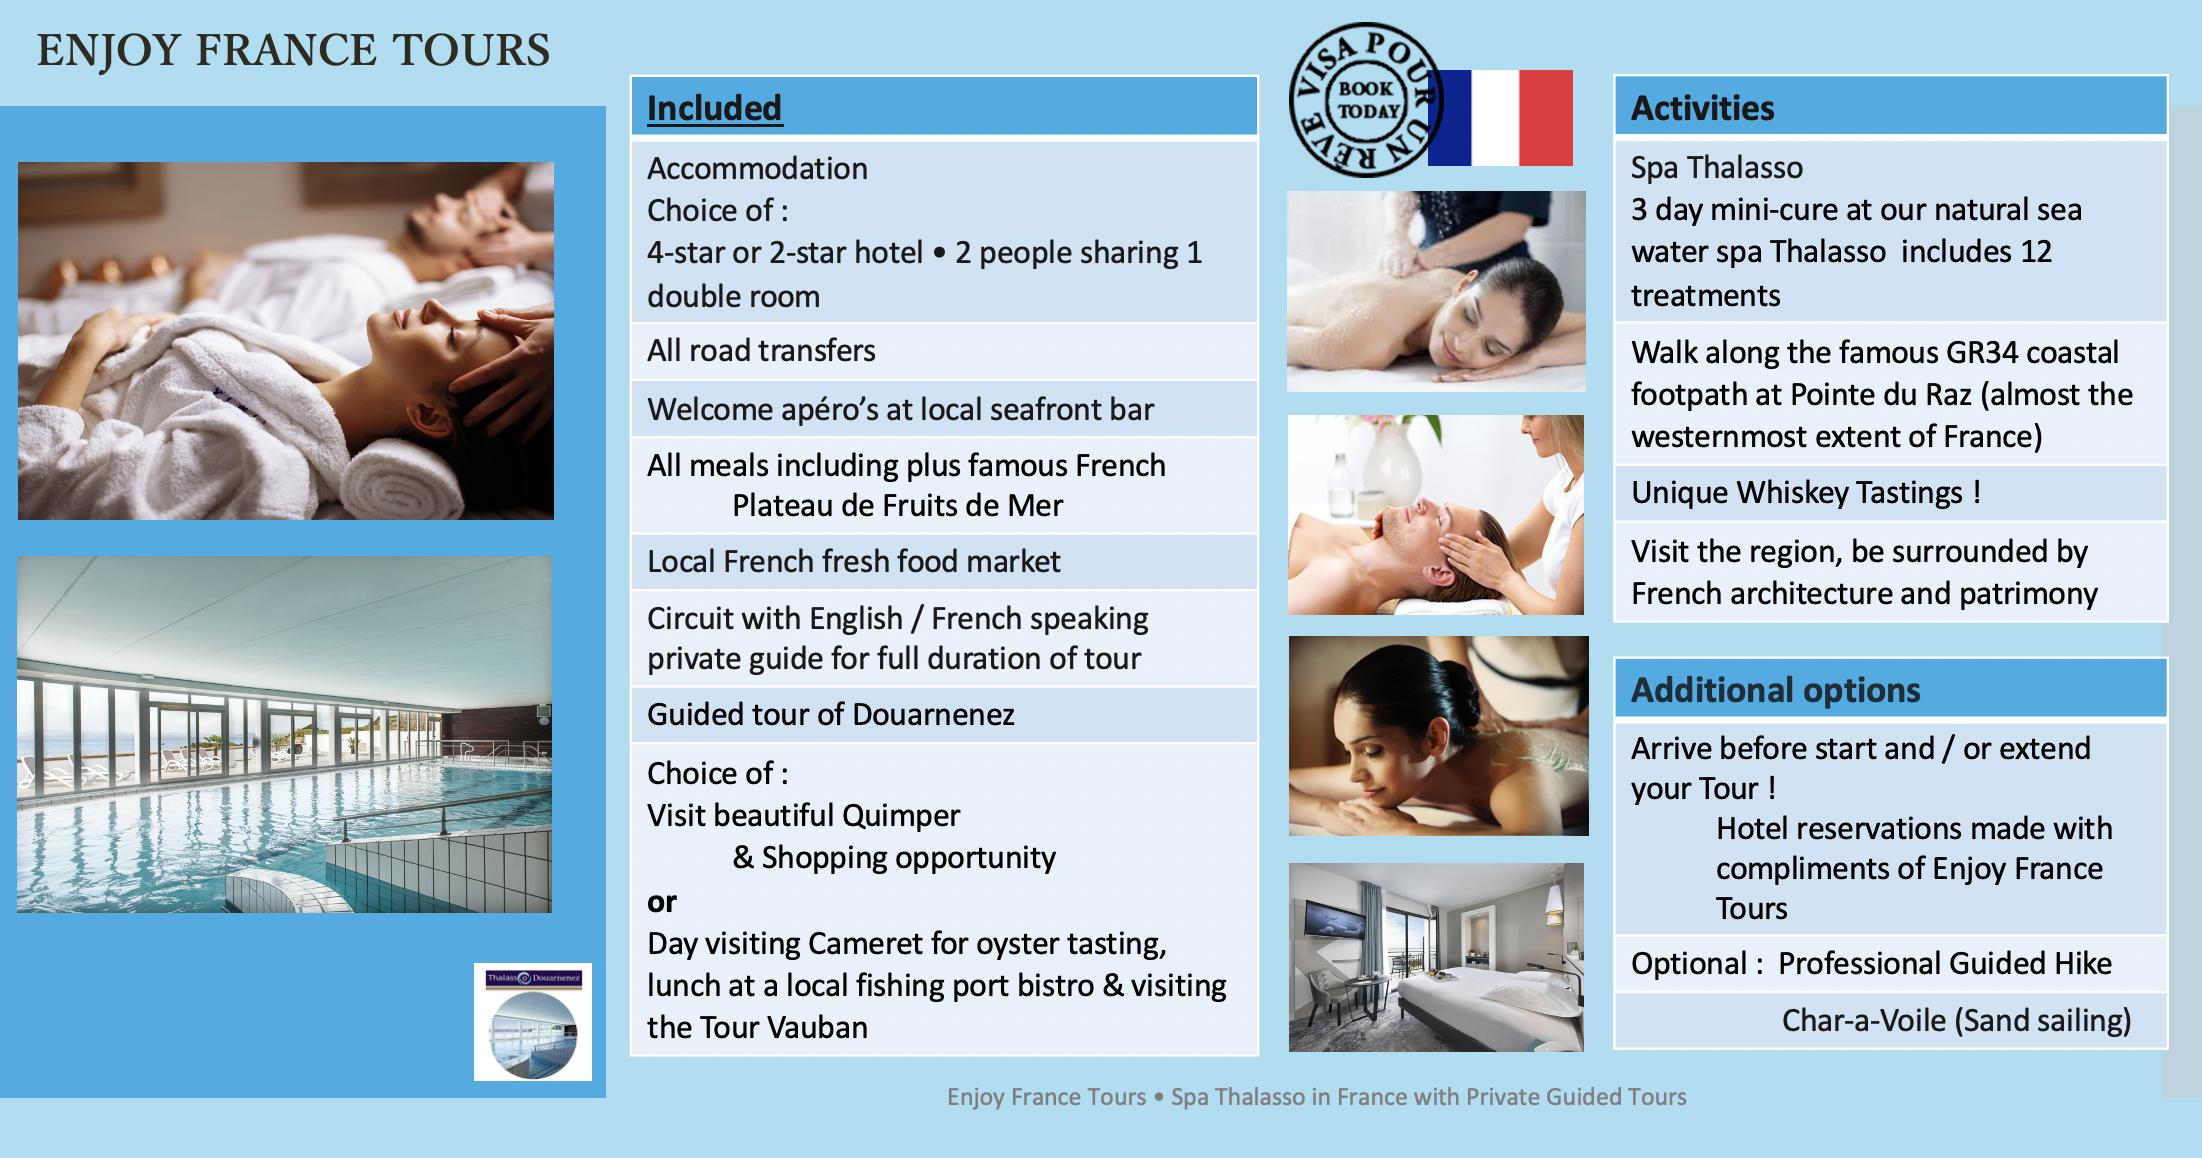 Enjoy France Tours SPA THALASSO Website Pg 2